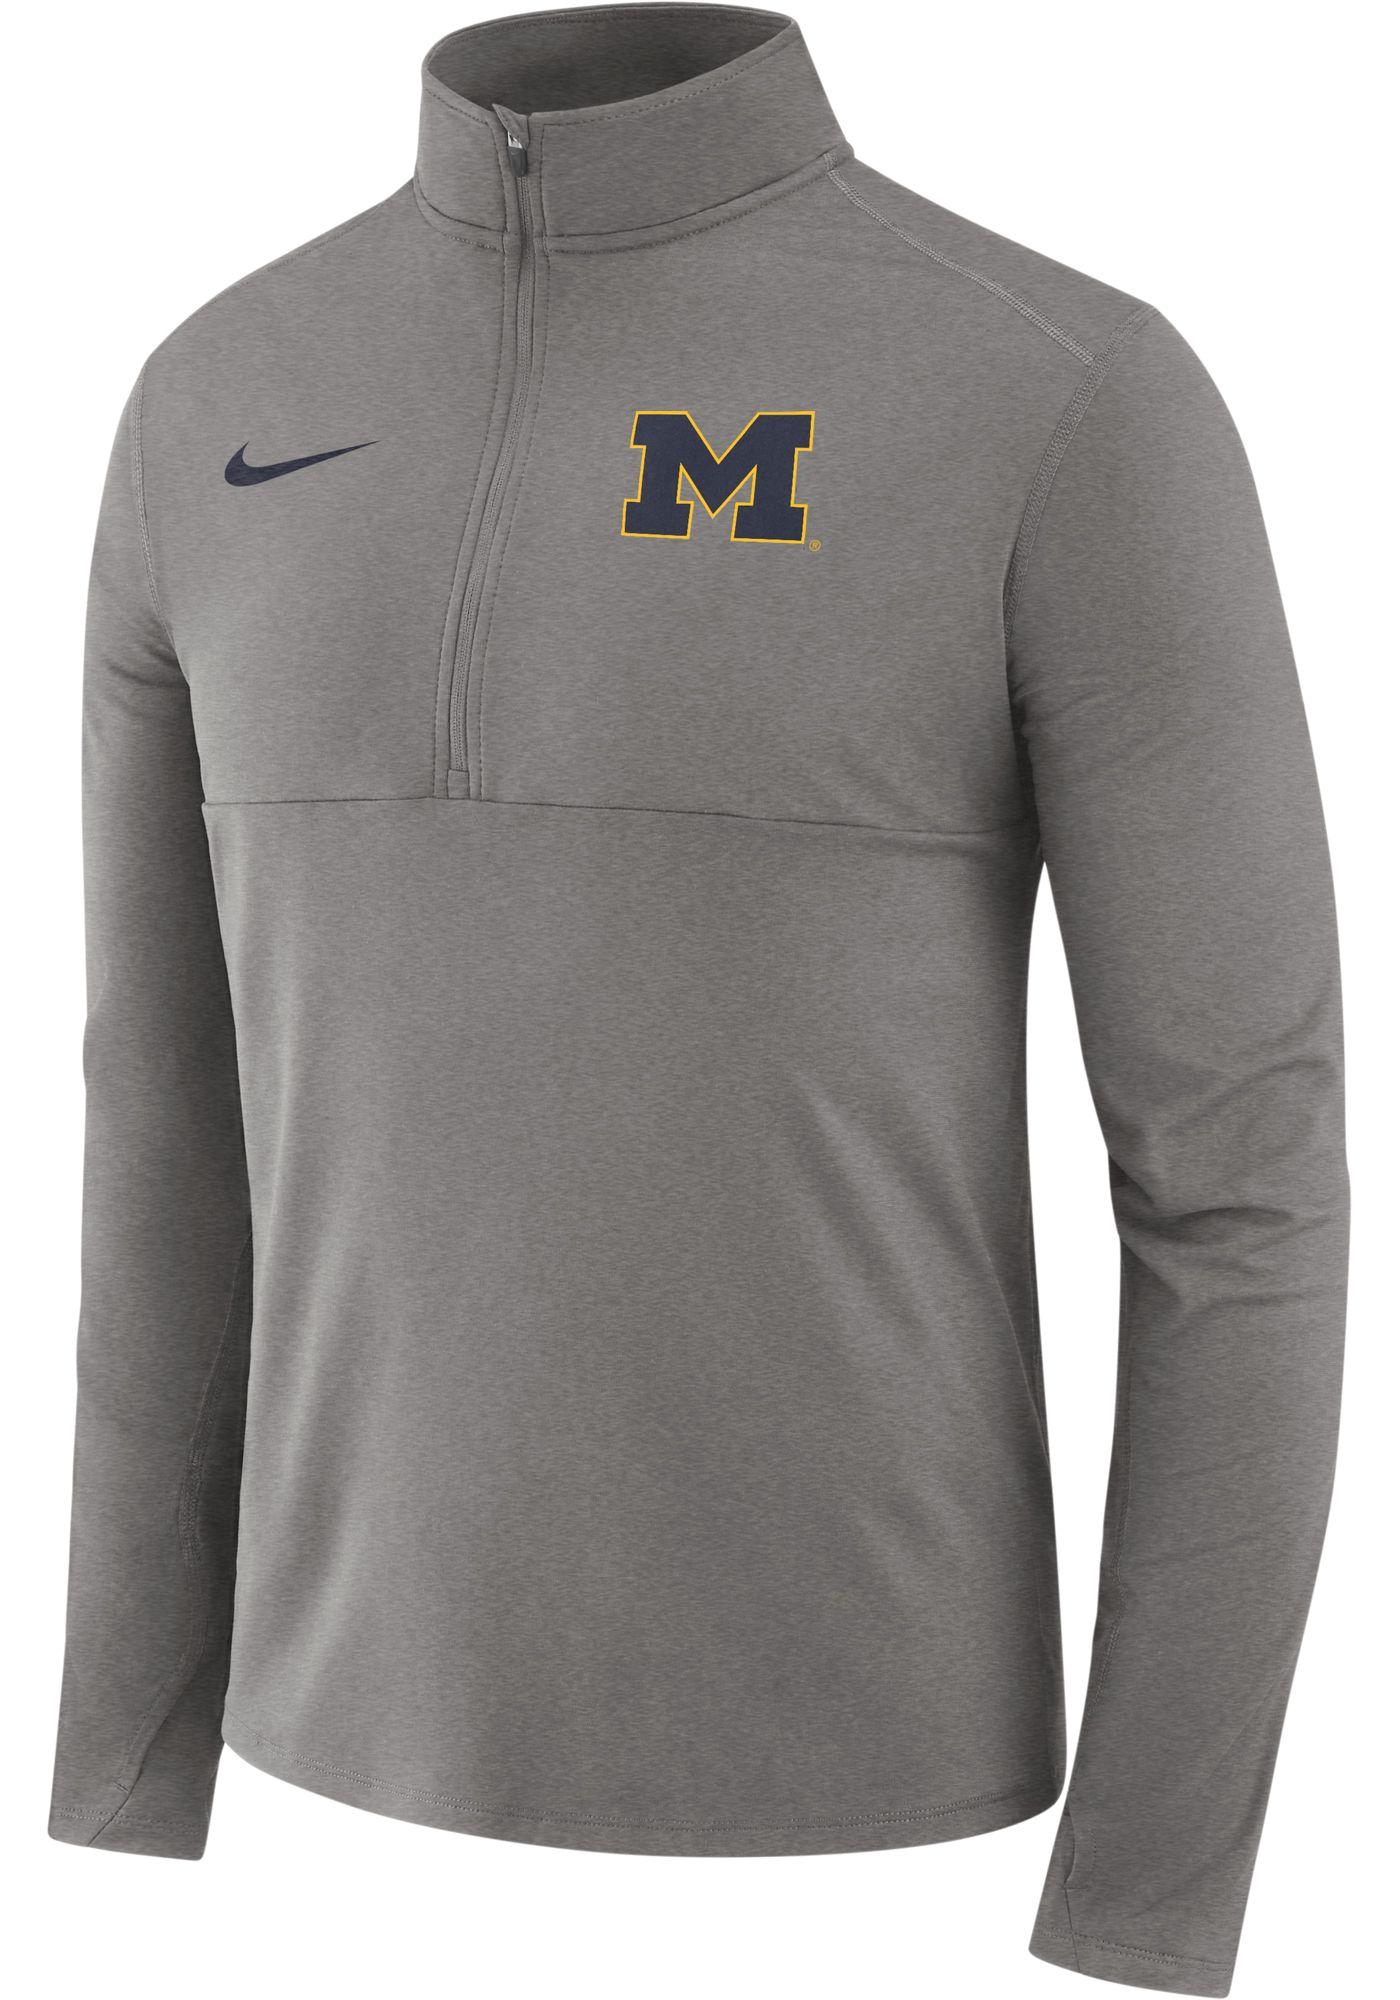 Nike Men's Michigan Wolverines Grey Long Sleeve Core Half-Zip Shirt